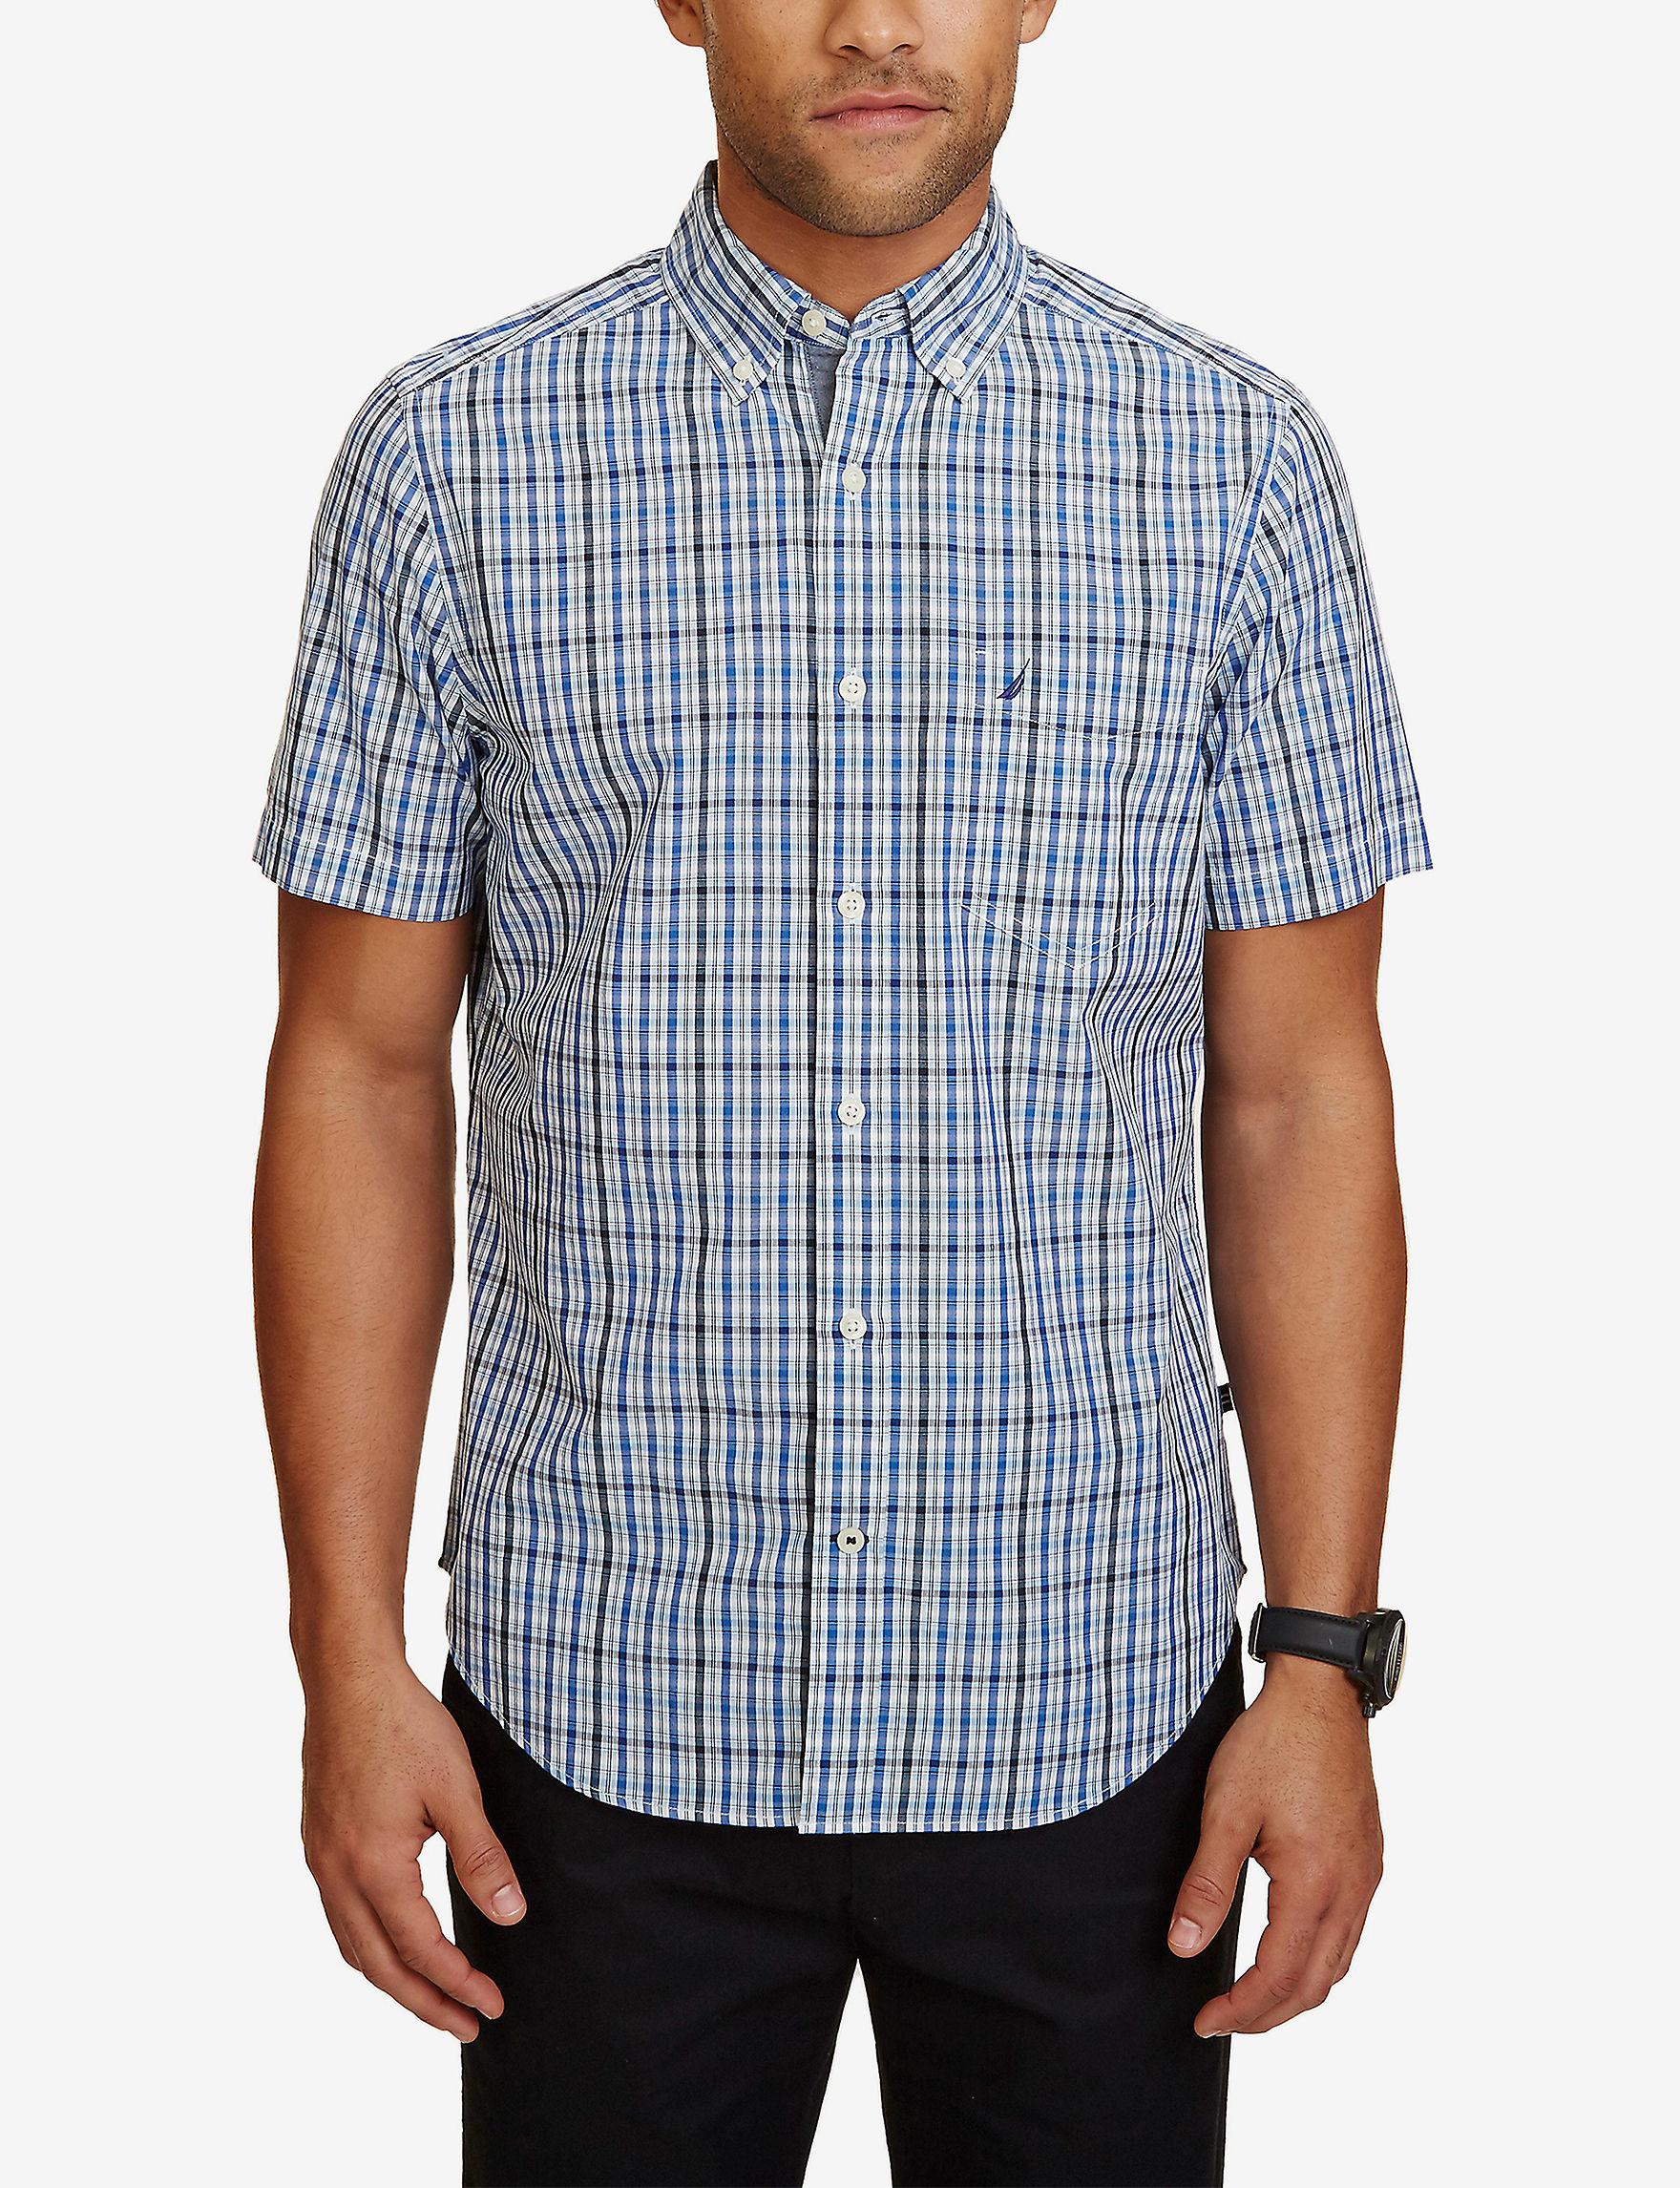 Nautica Cobalt Blue Casual Button Down Shirts